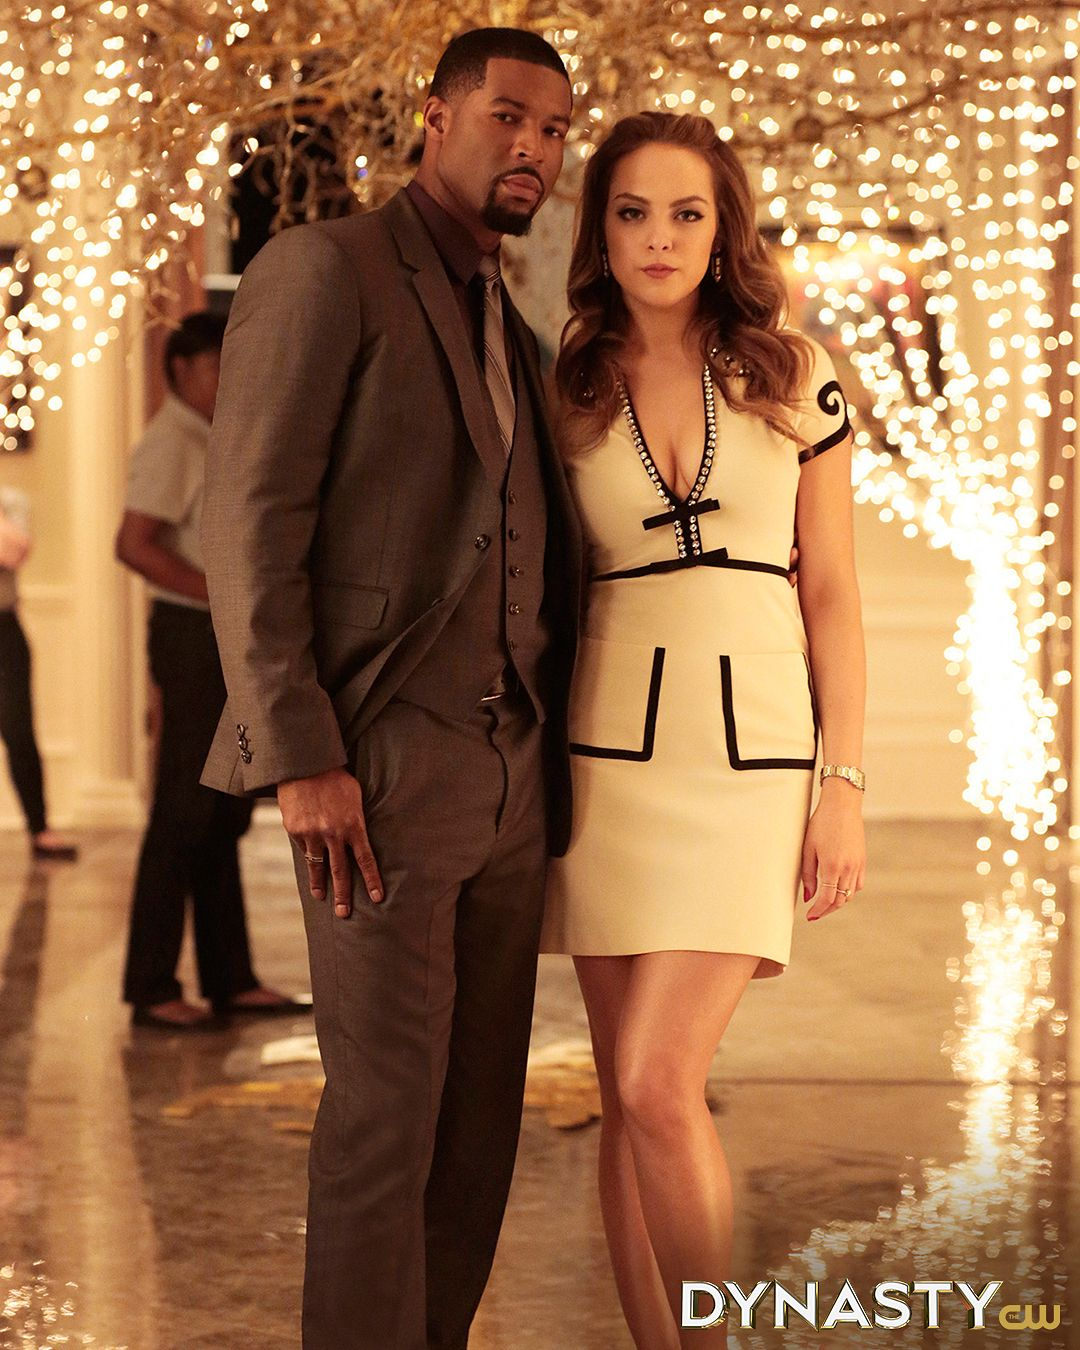 Fallon Carrington On Dynasty 1x10 Fash Pinterest Movies